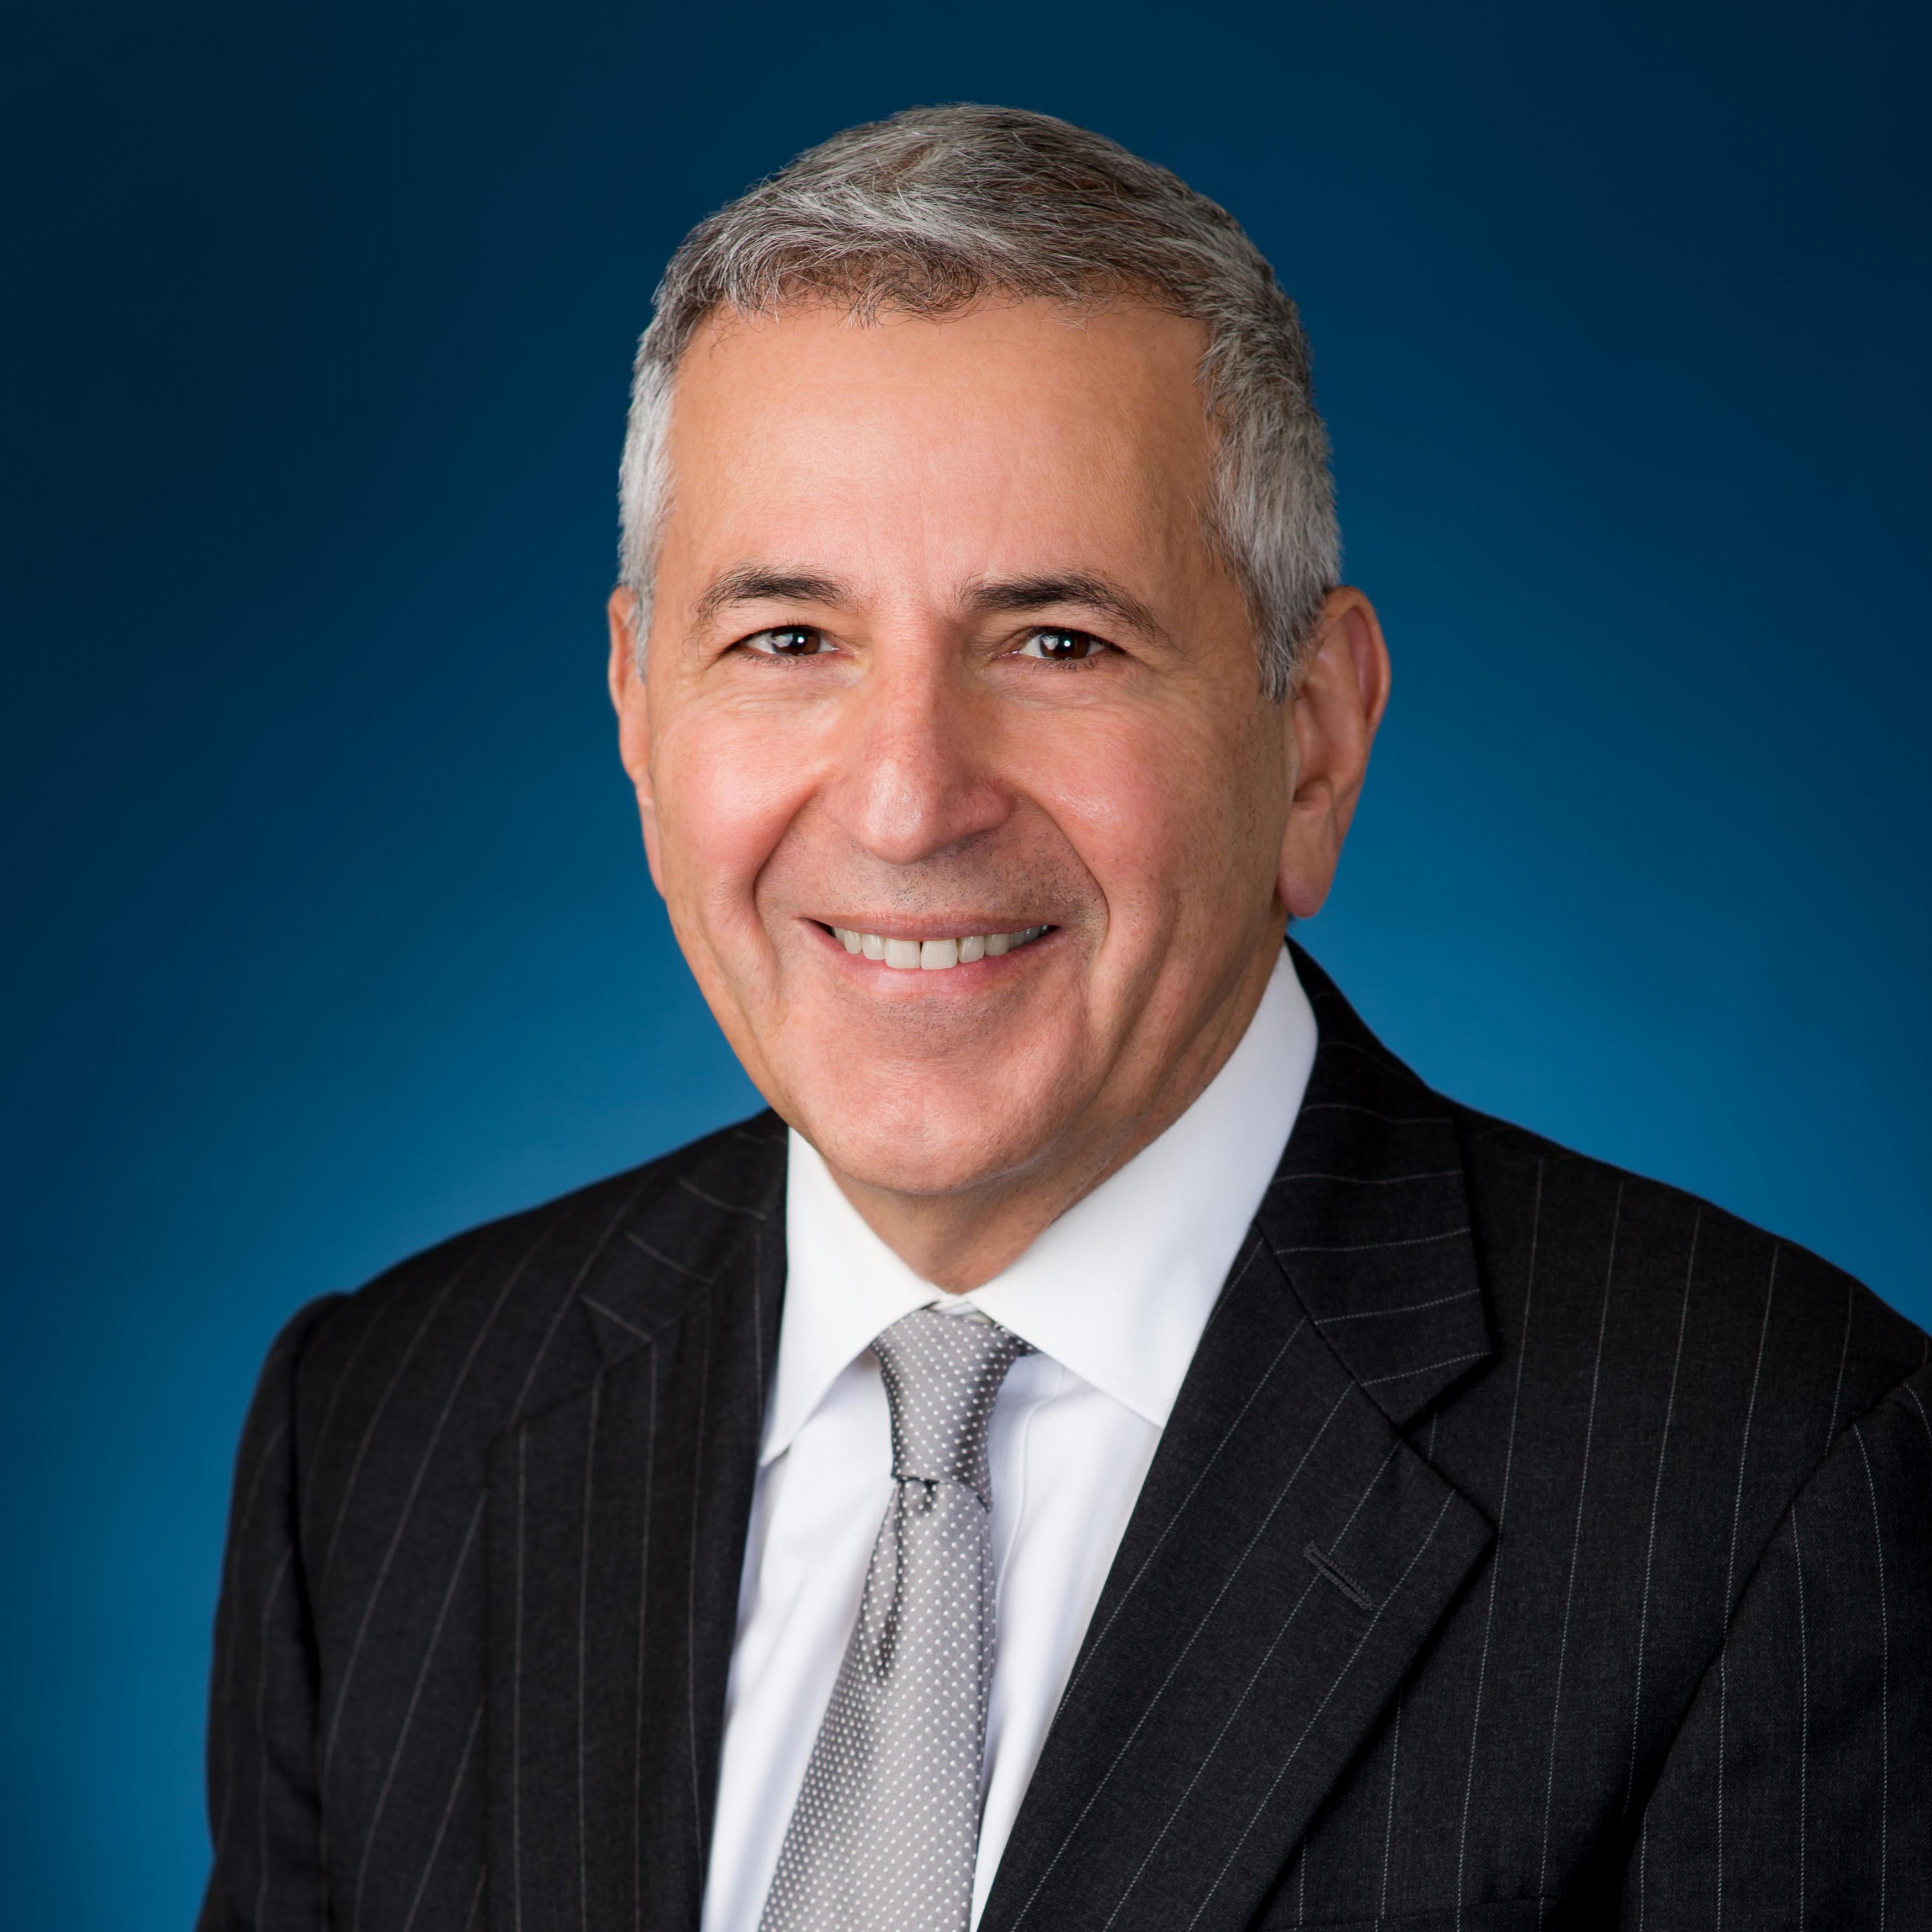 Wayne M. Roth